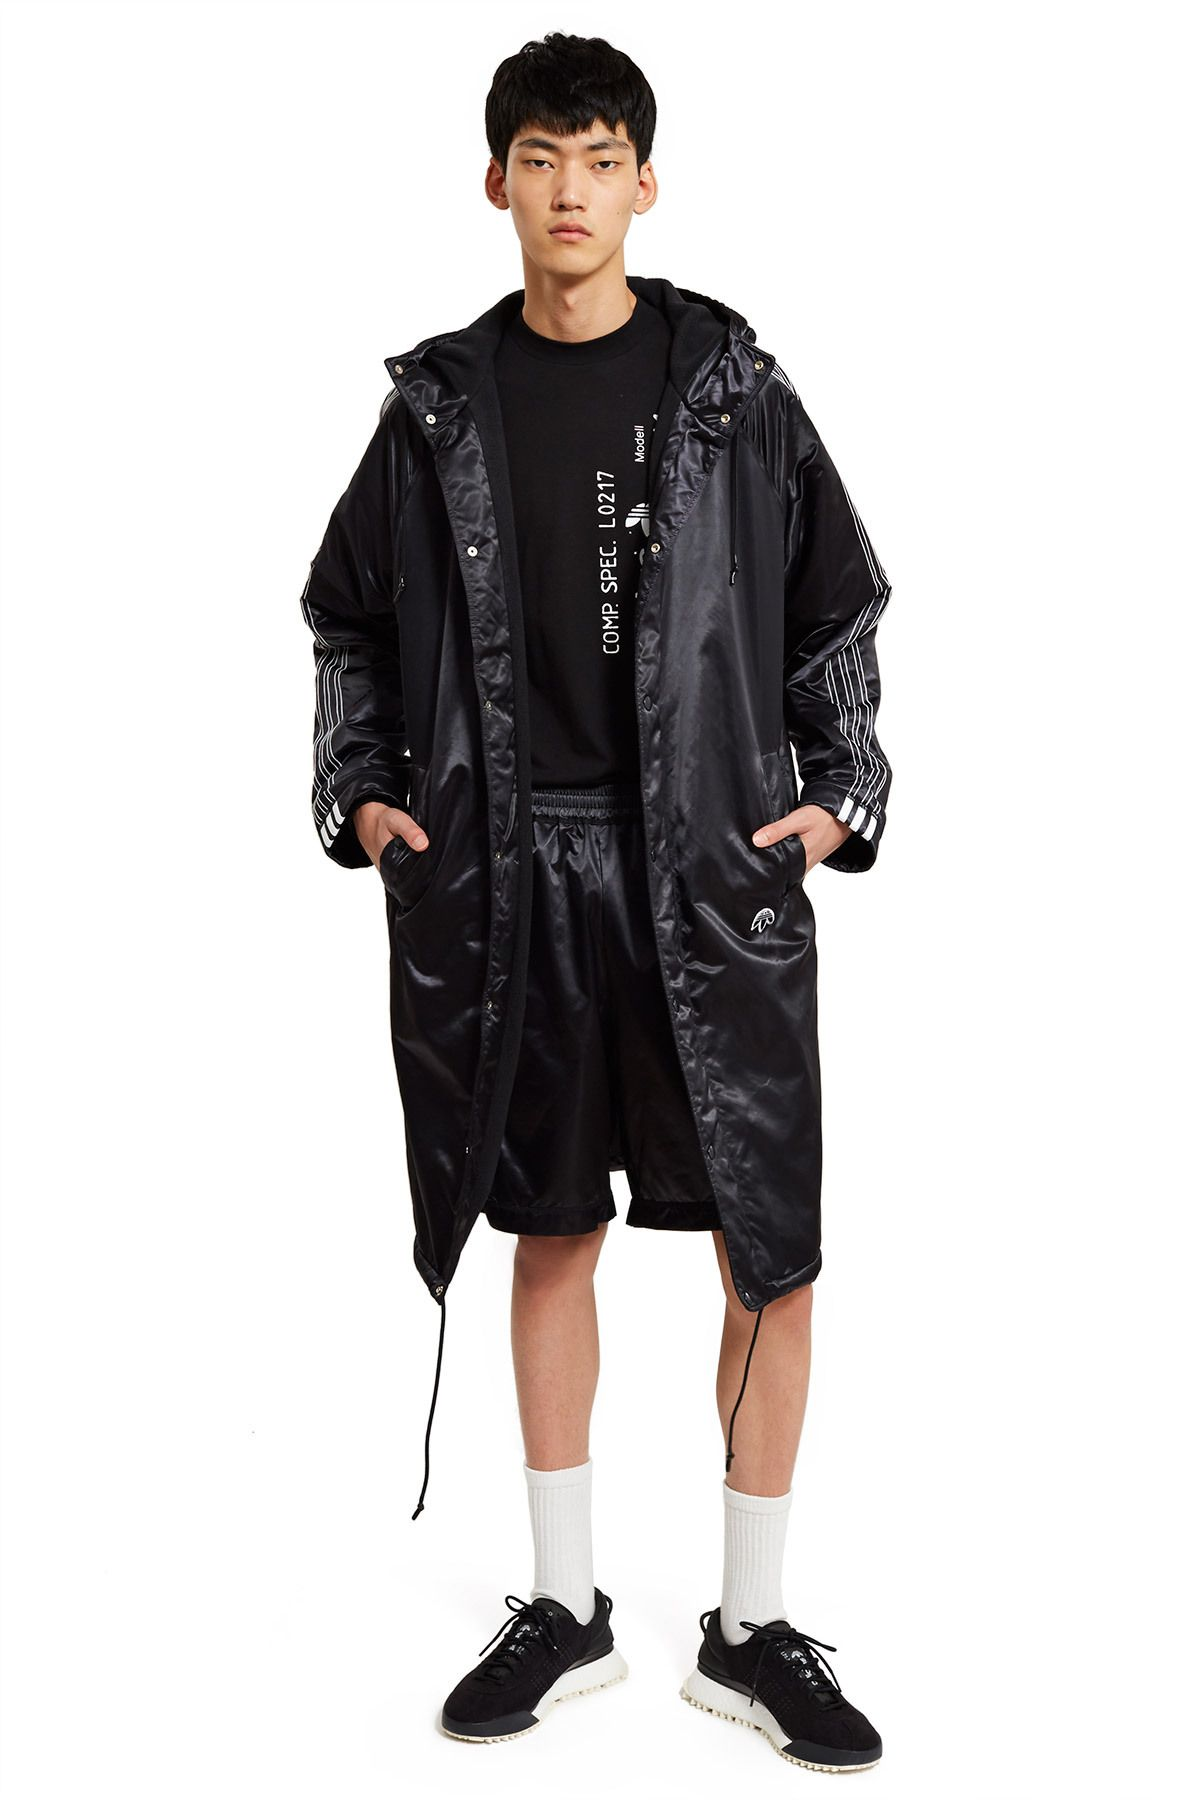 reaccionar Noticias de última hora respuesta  adidas Originals by Alexander Wang, Stadium Jacket Season 2 of adidas  Originals by Alexander Wang is inspired by the culture … | Clothes for  women, Jackets, Clothes